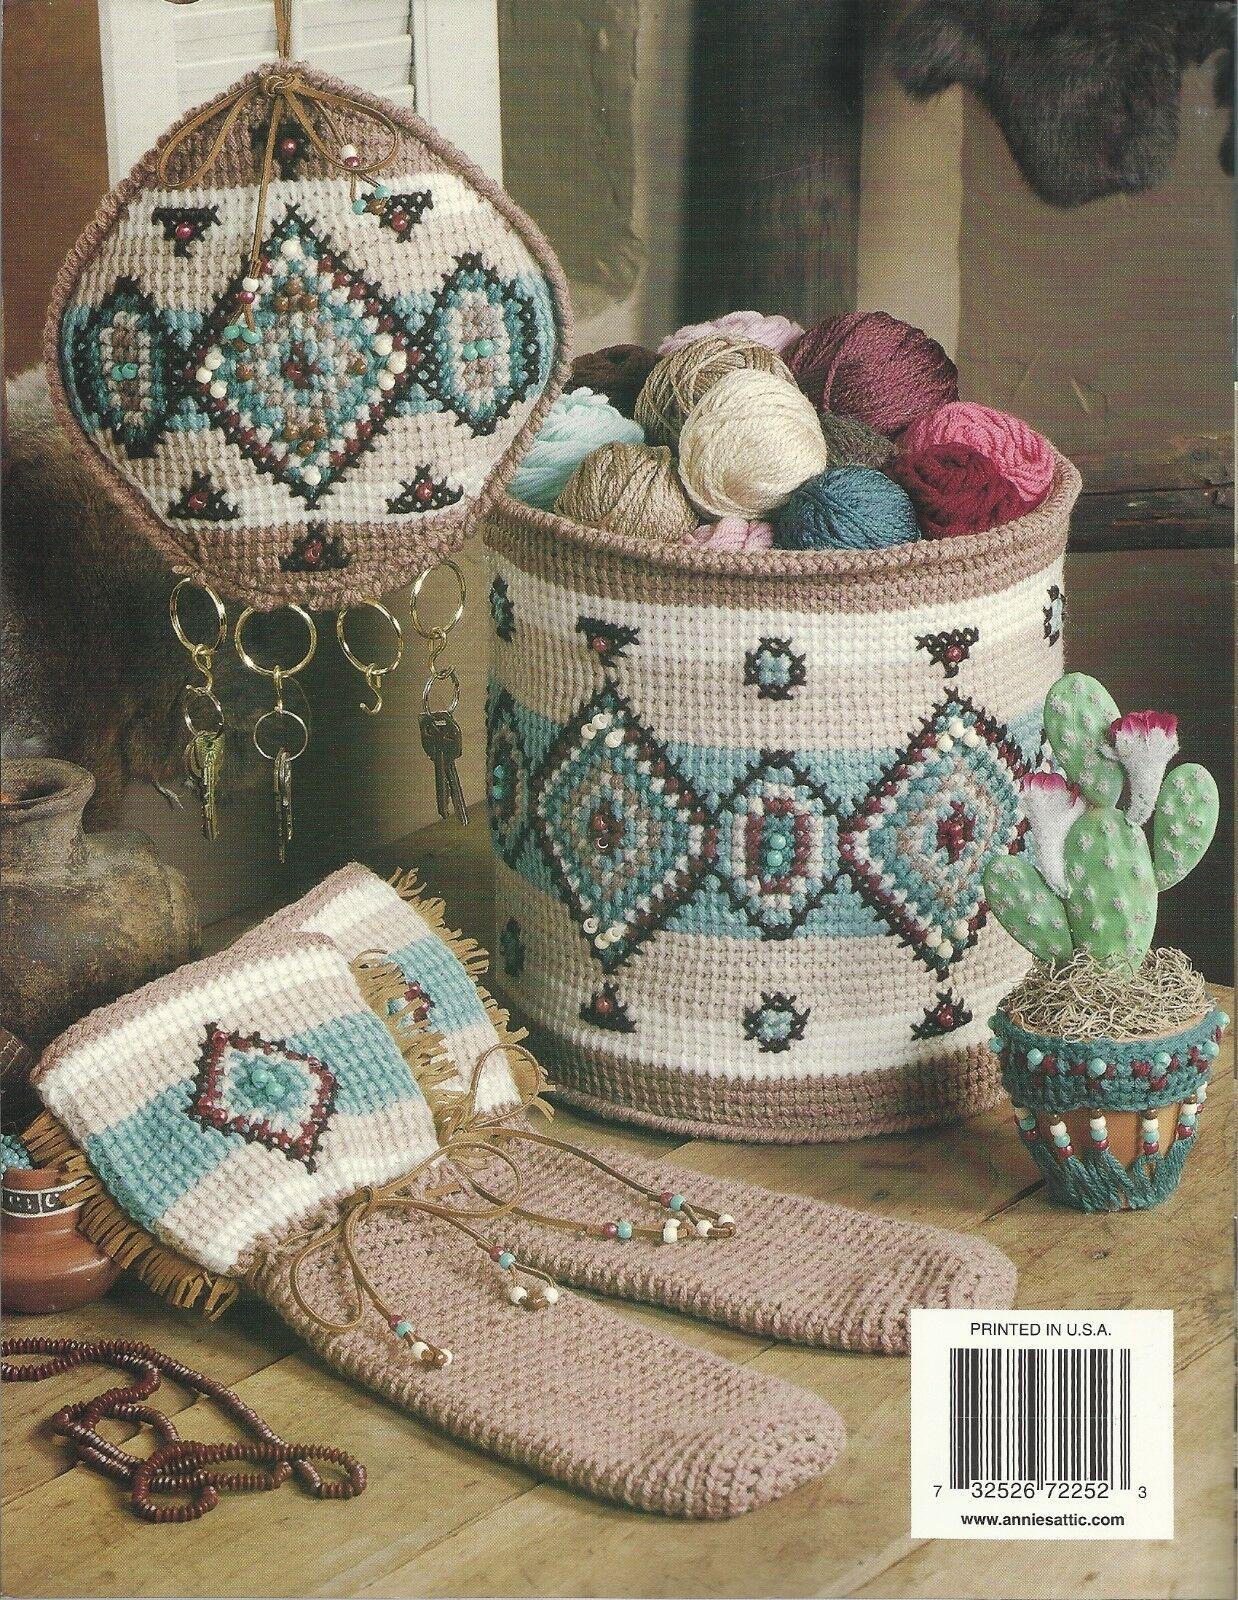 Southwest Charm Crochet Patterns Afghan Basket Marilyn Mezer Annies